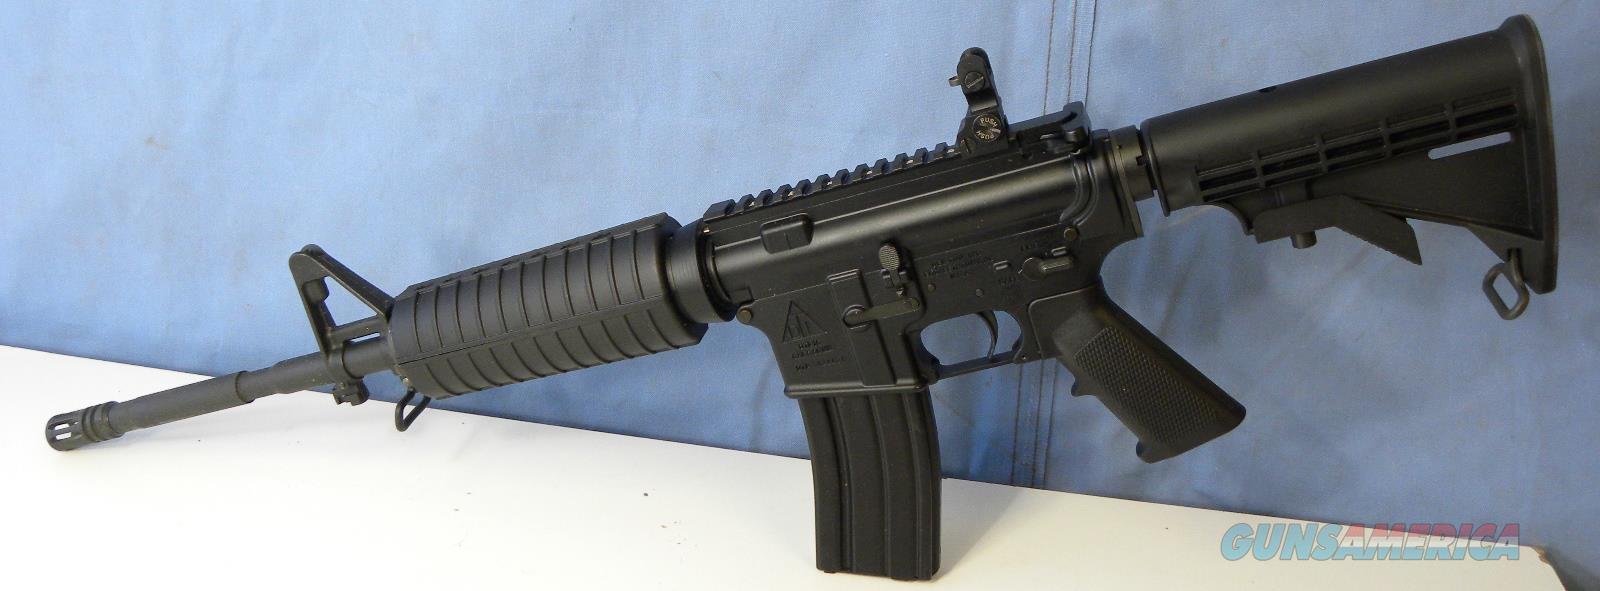 Delton Extreme 316   Guns > Rifles > Delton > Delton Rifles